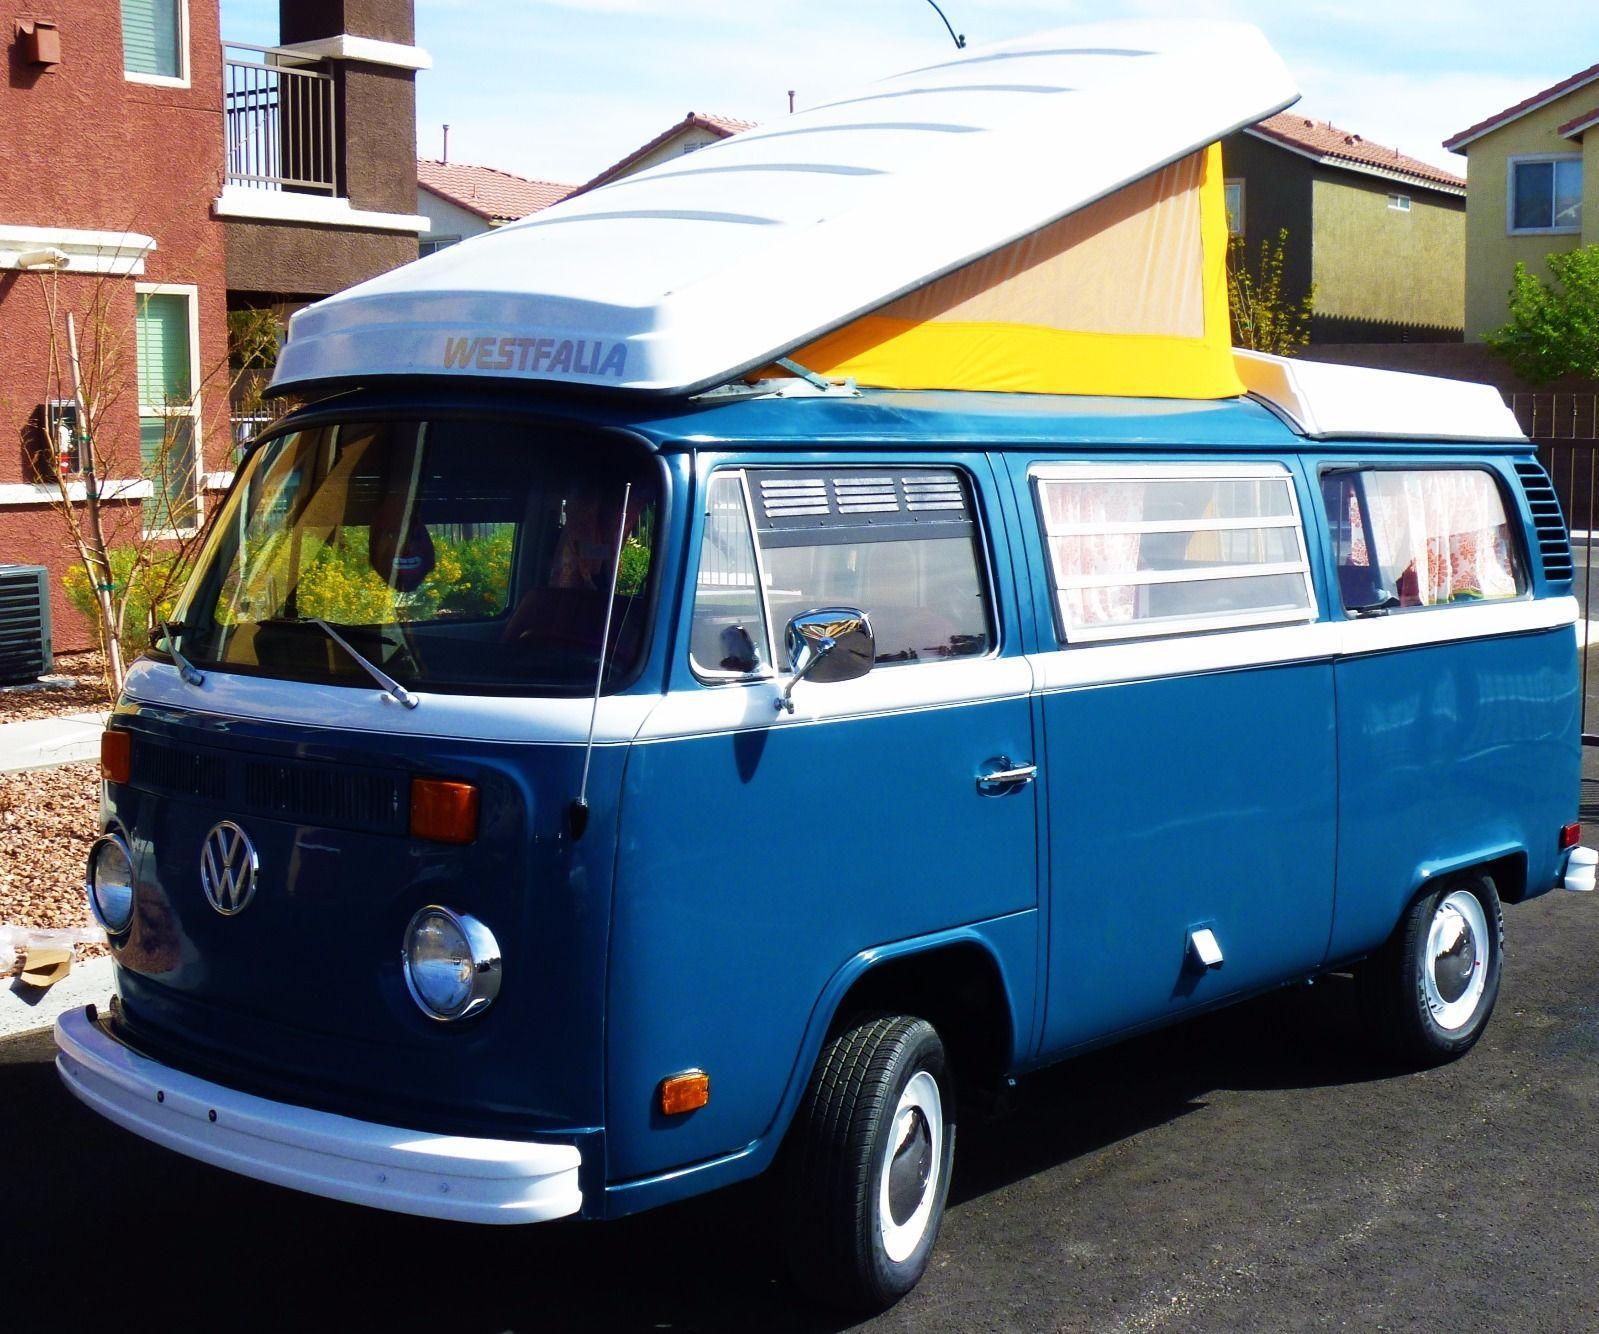 1973 Volkswagen Bus Westfalia Type 2 Campmobile for sale